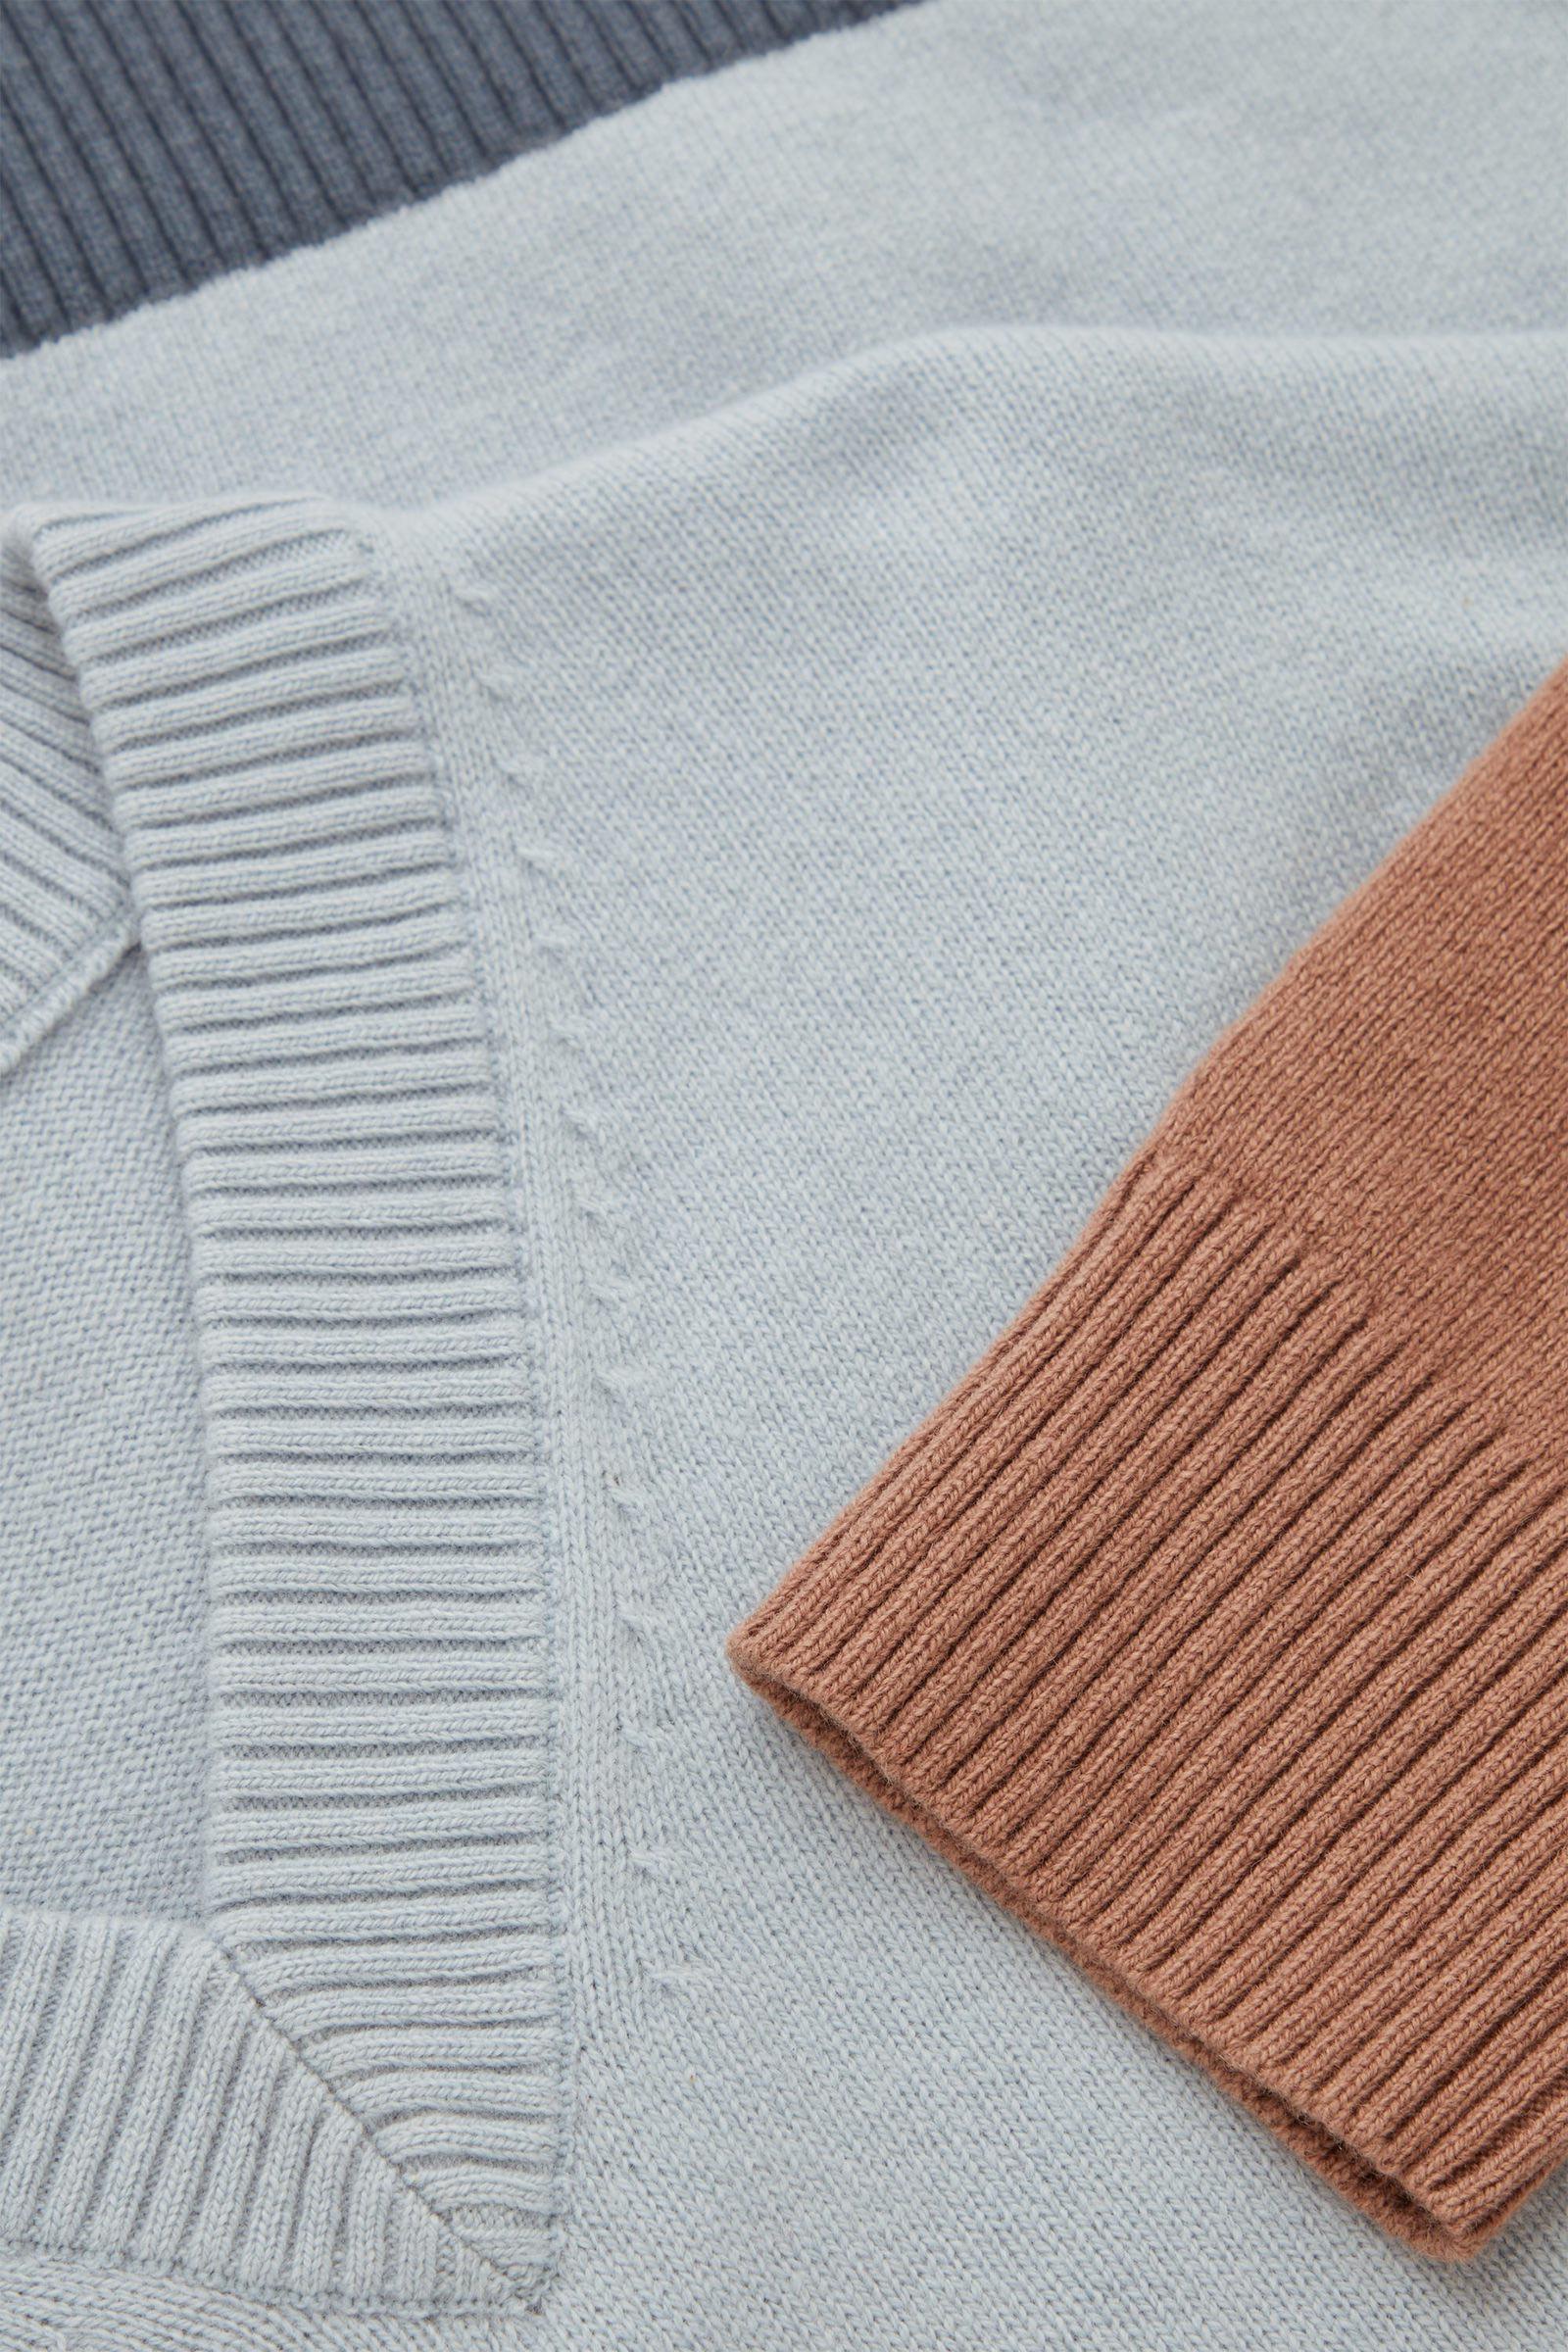 COS 컬러 블록 울 코튼 스웨터의 터쿼이즈컬러 Detail입니다.